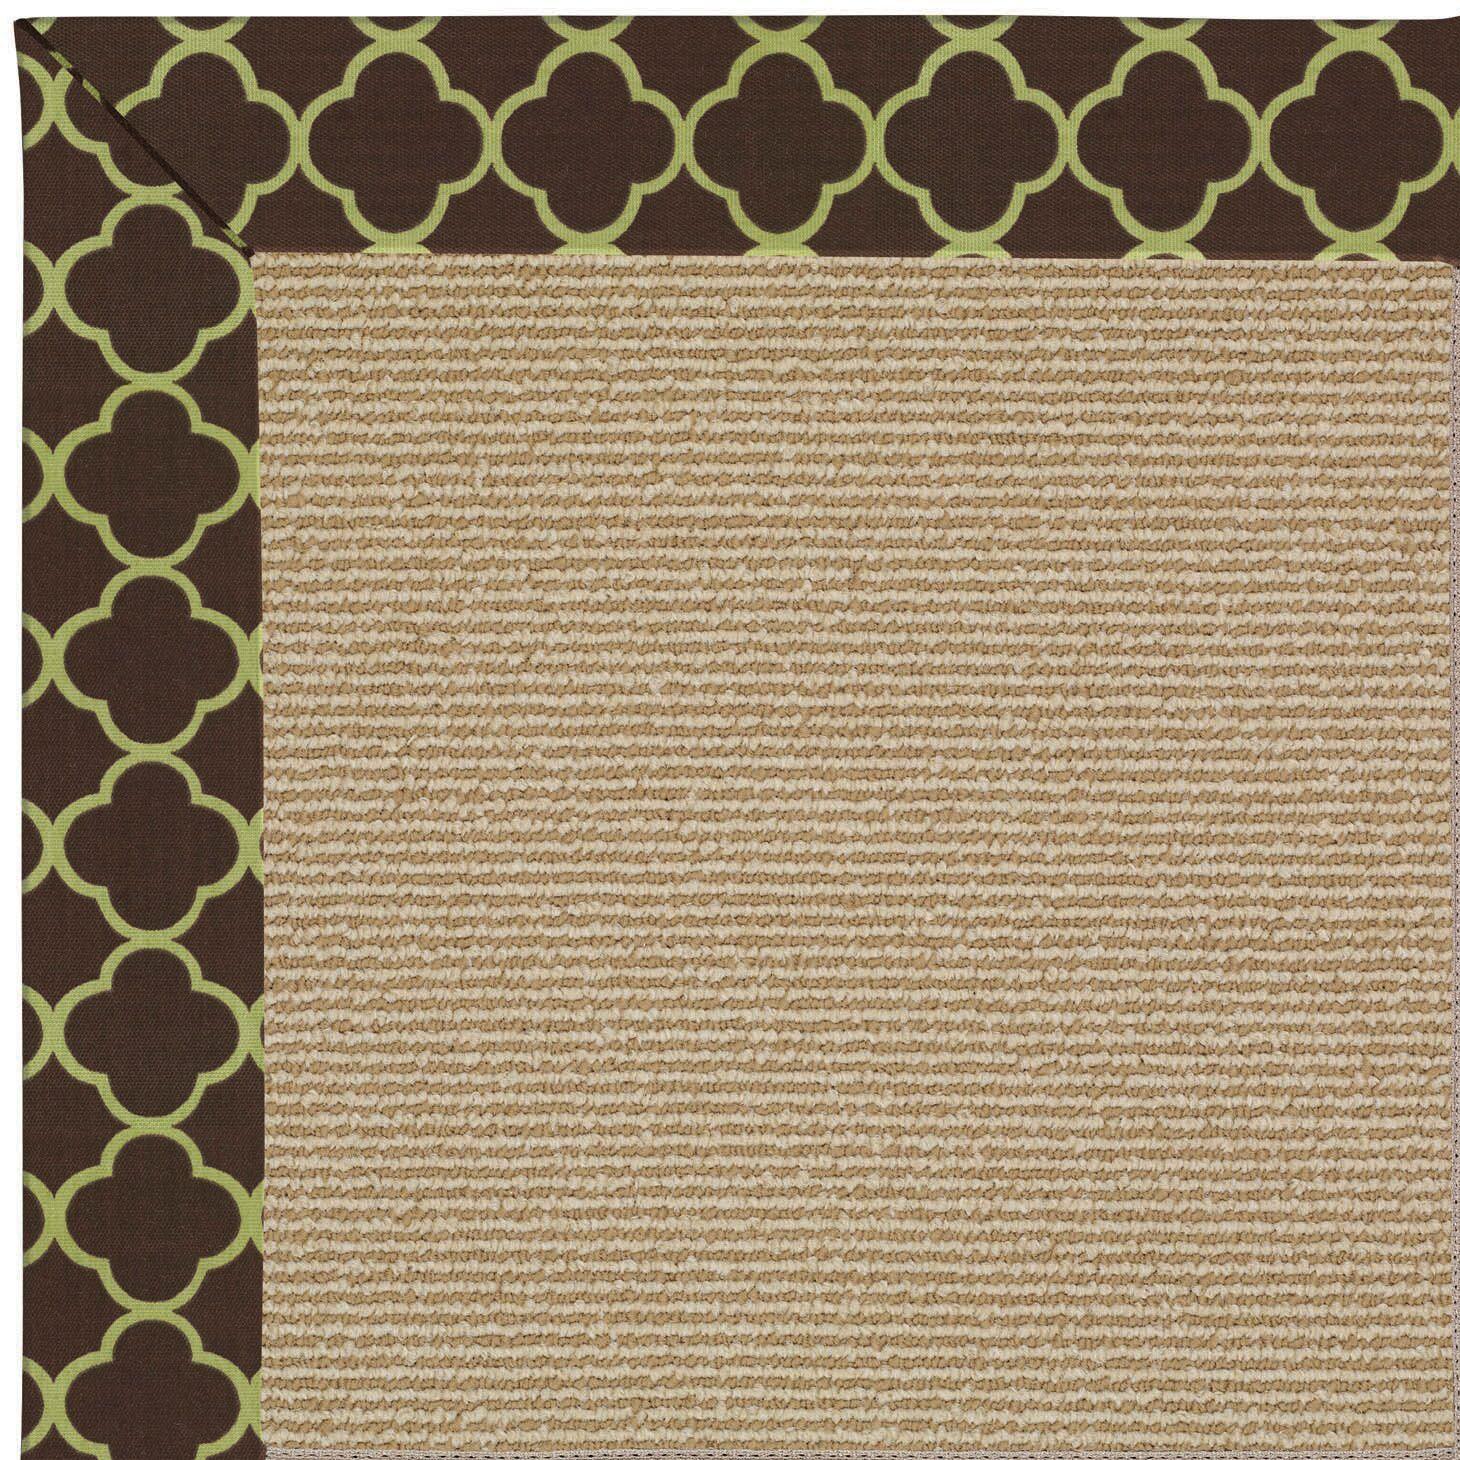 Lisle Beige Indoor/Outdoor Area Rug Rug Size: Rectangle 7' x 9'